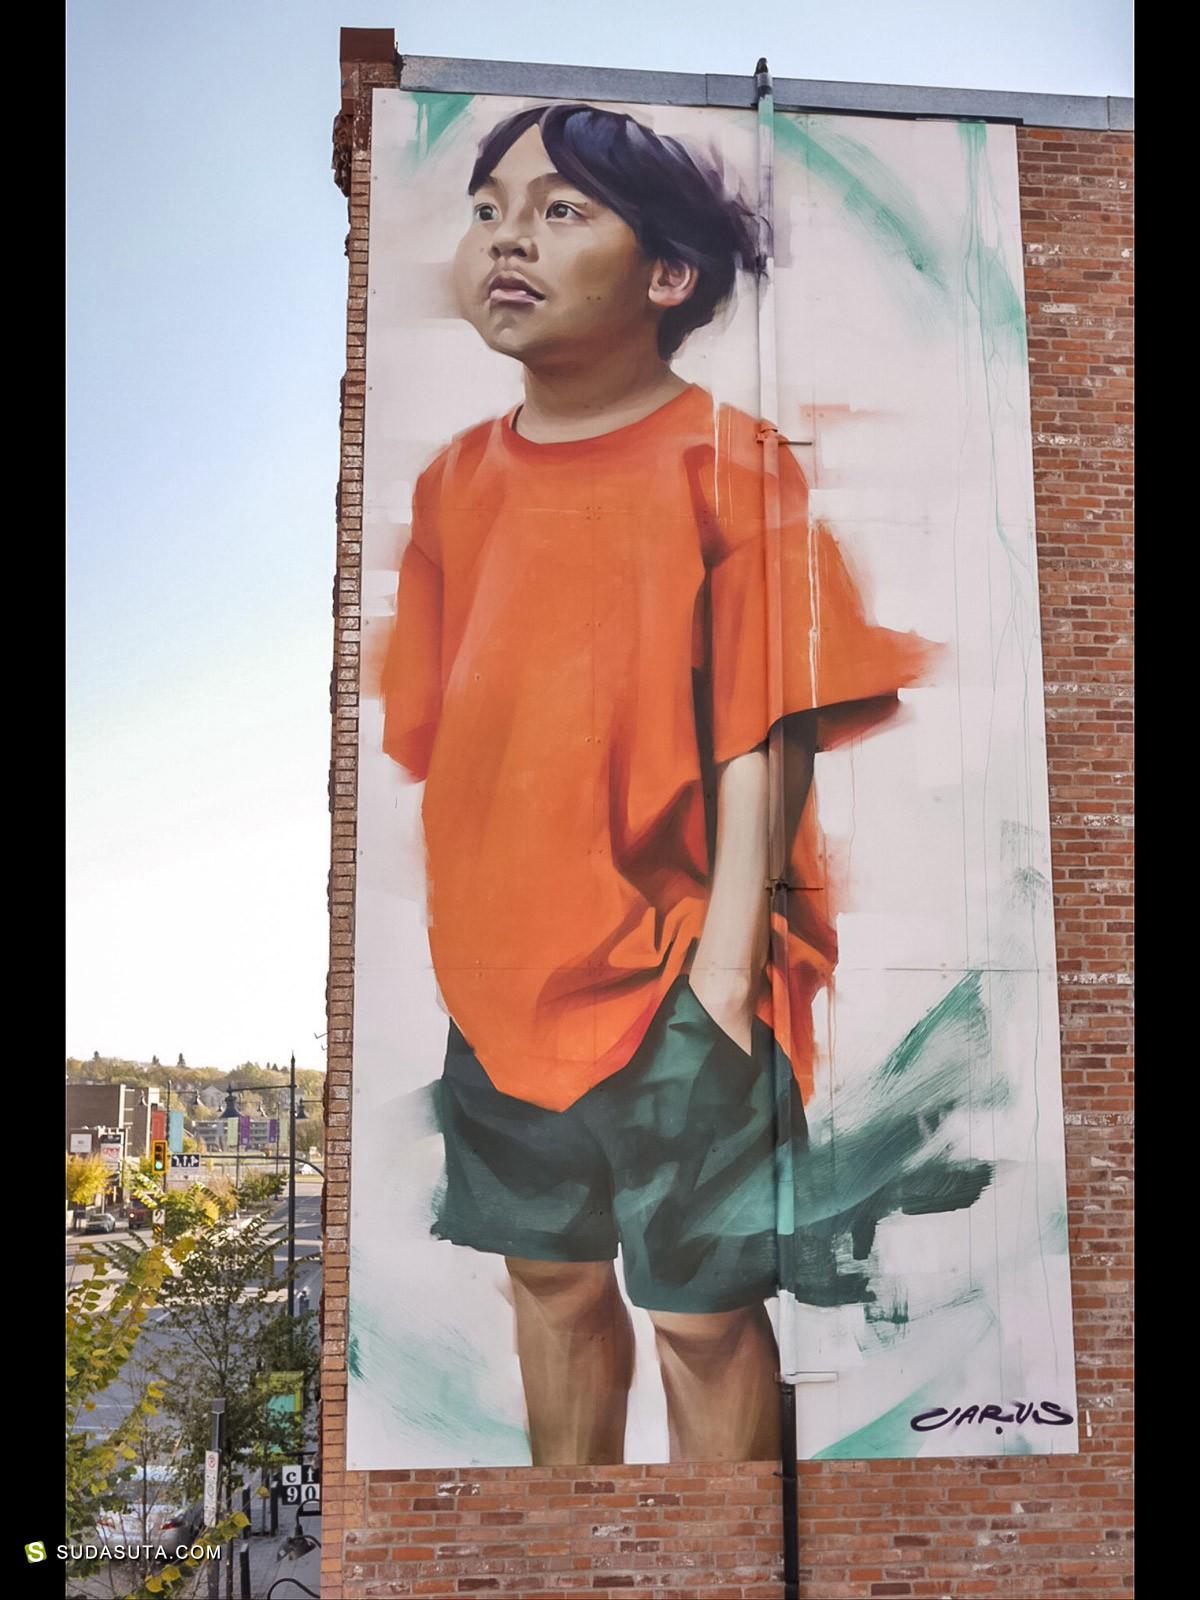 城市艺术家 Emmanuel Jarus